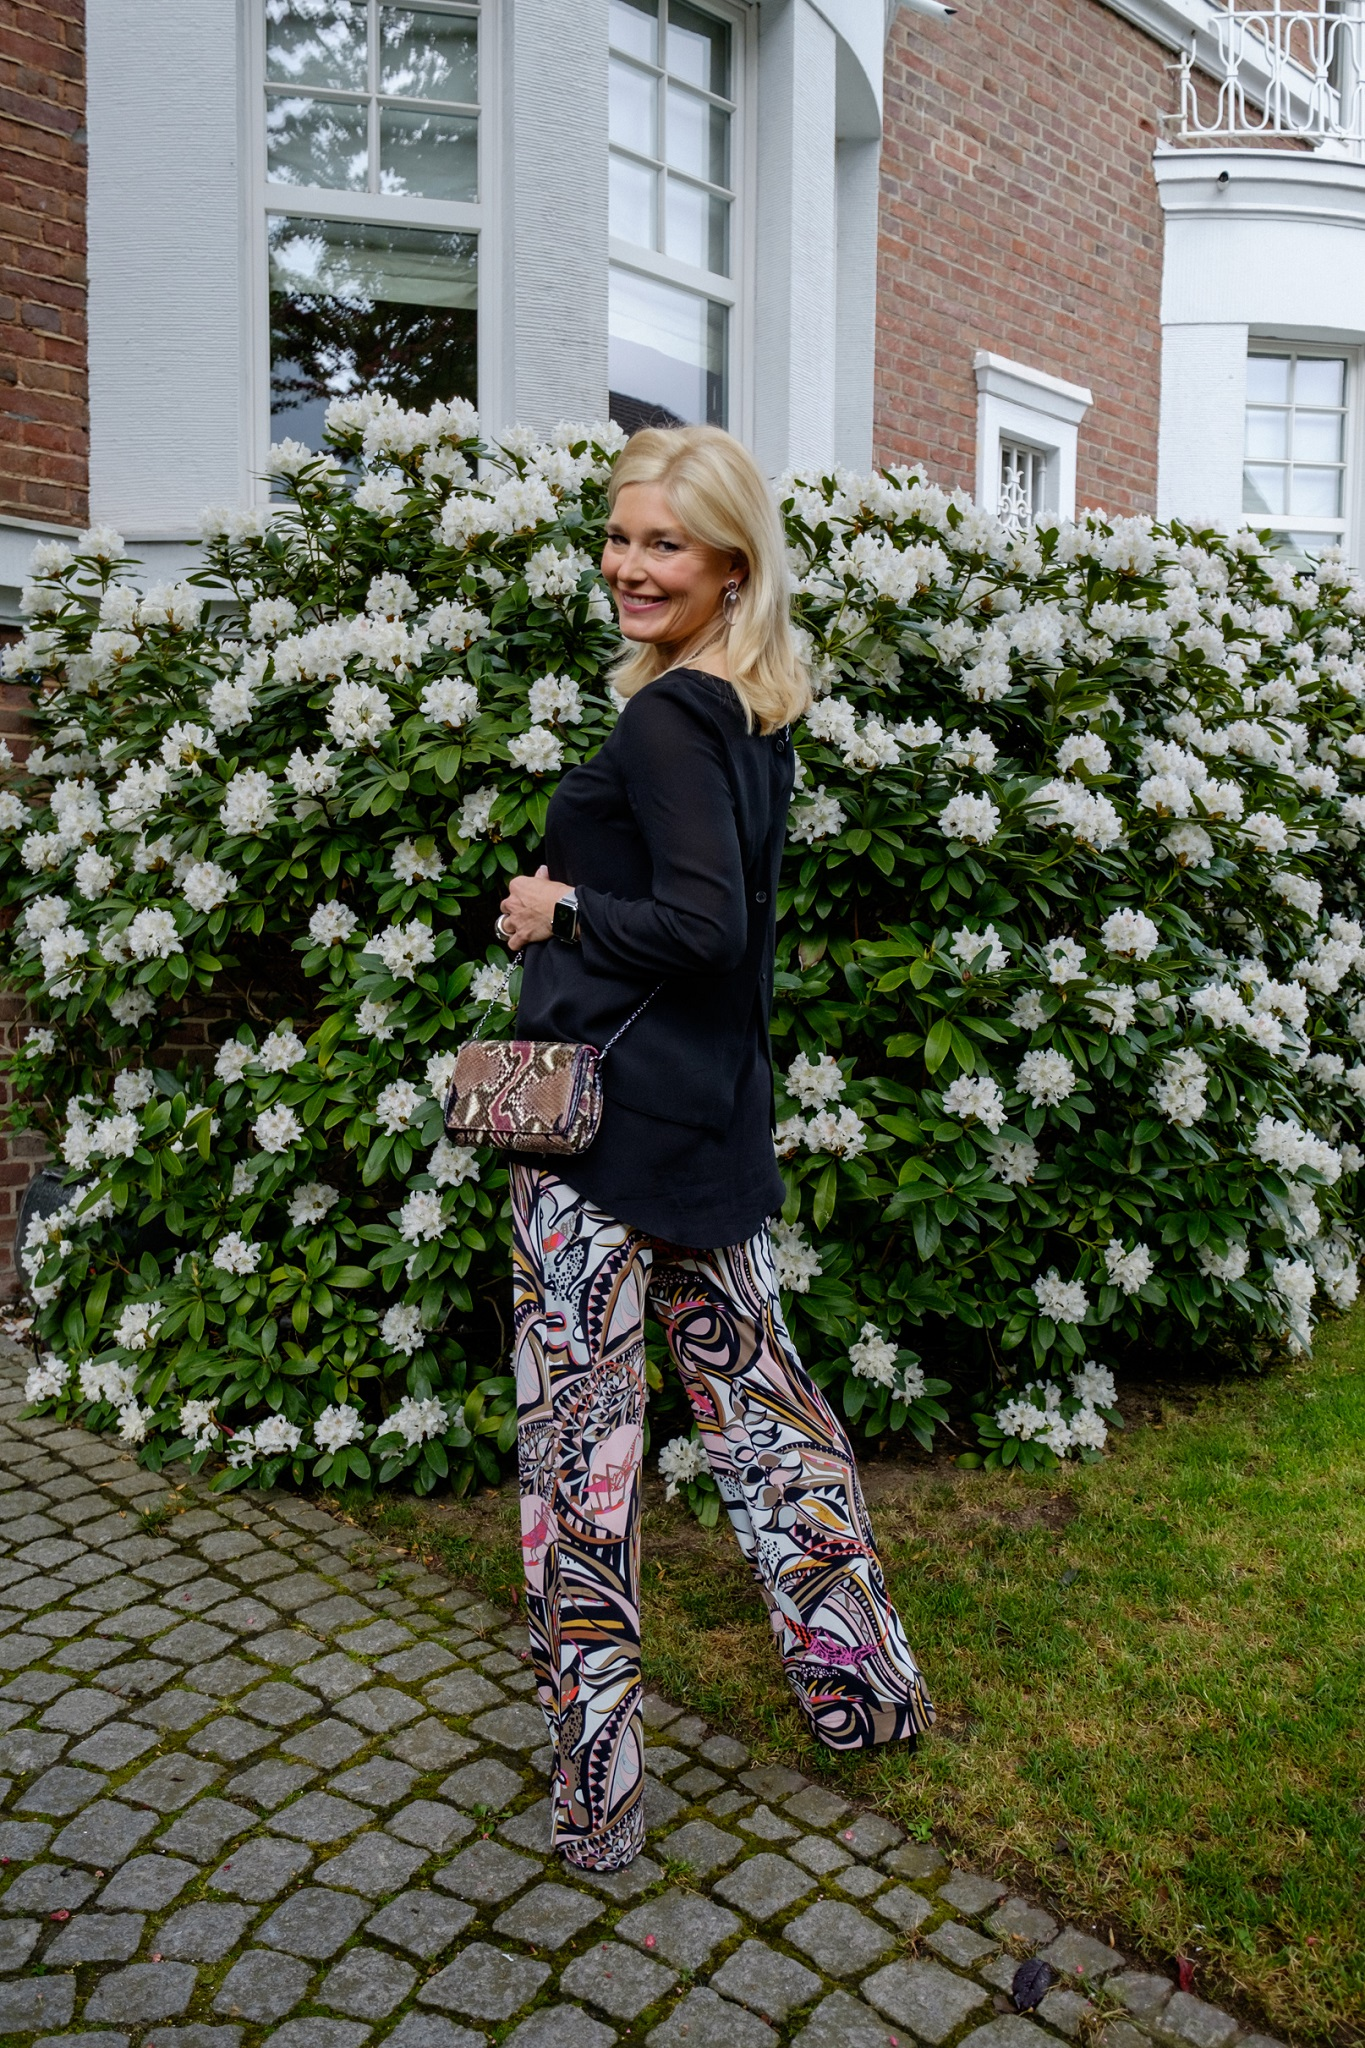 Pucci, Abendoutfit, Abend Look, evening look, evening style, Modeblog, Fashion Blog, Fashionblog, Lieblingsstil